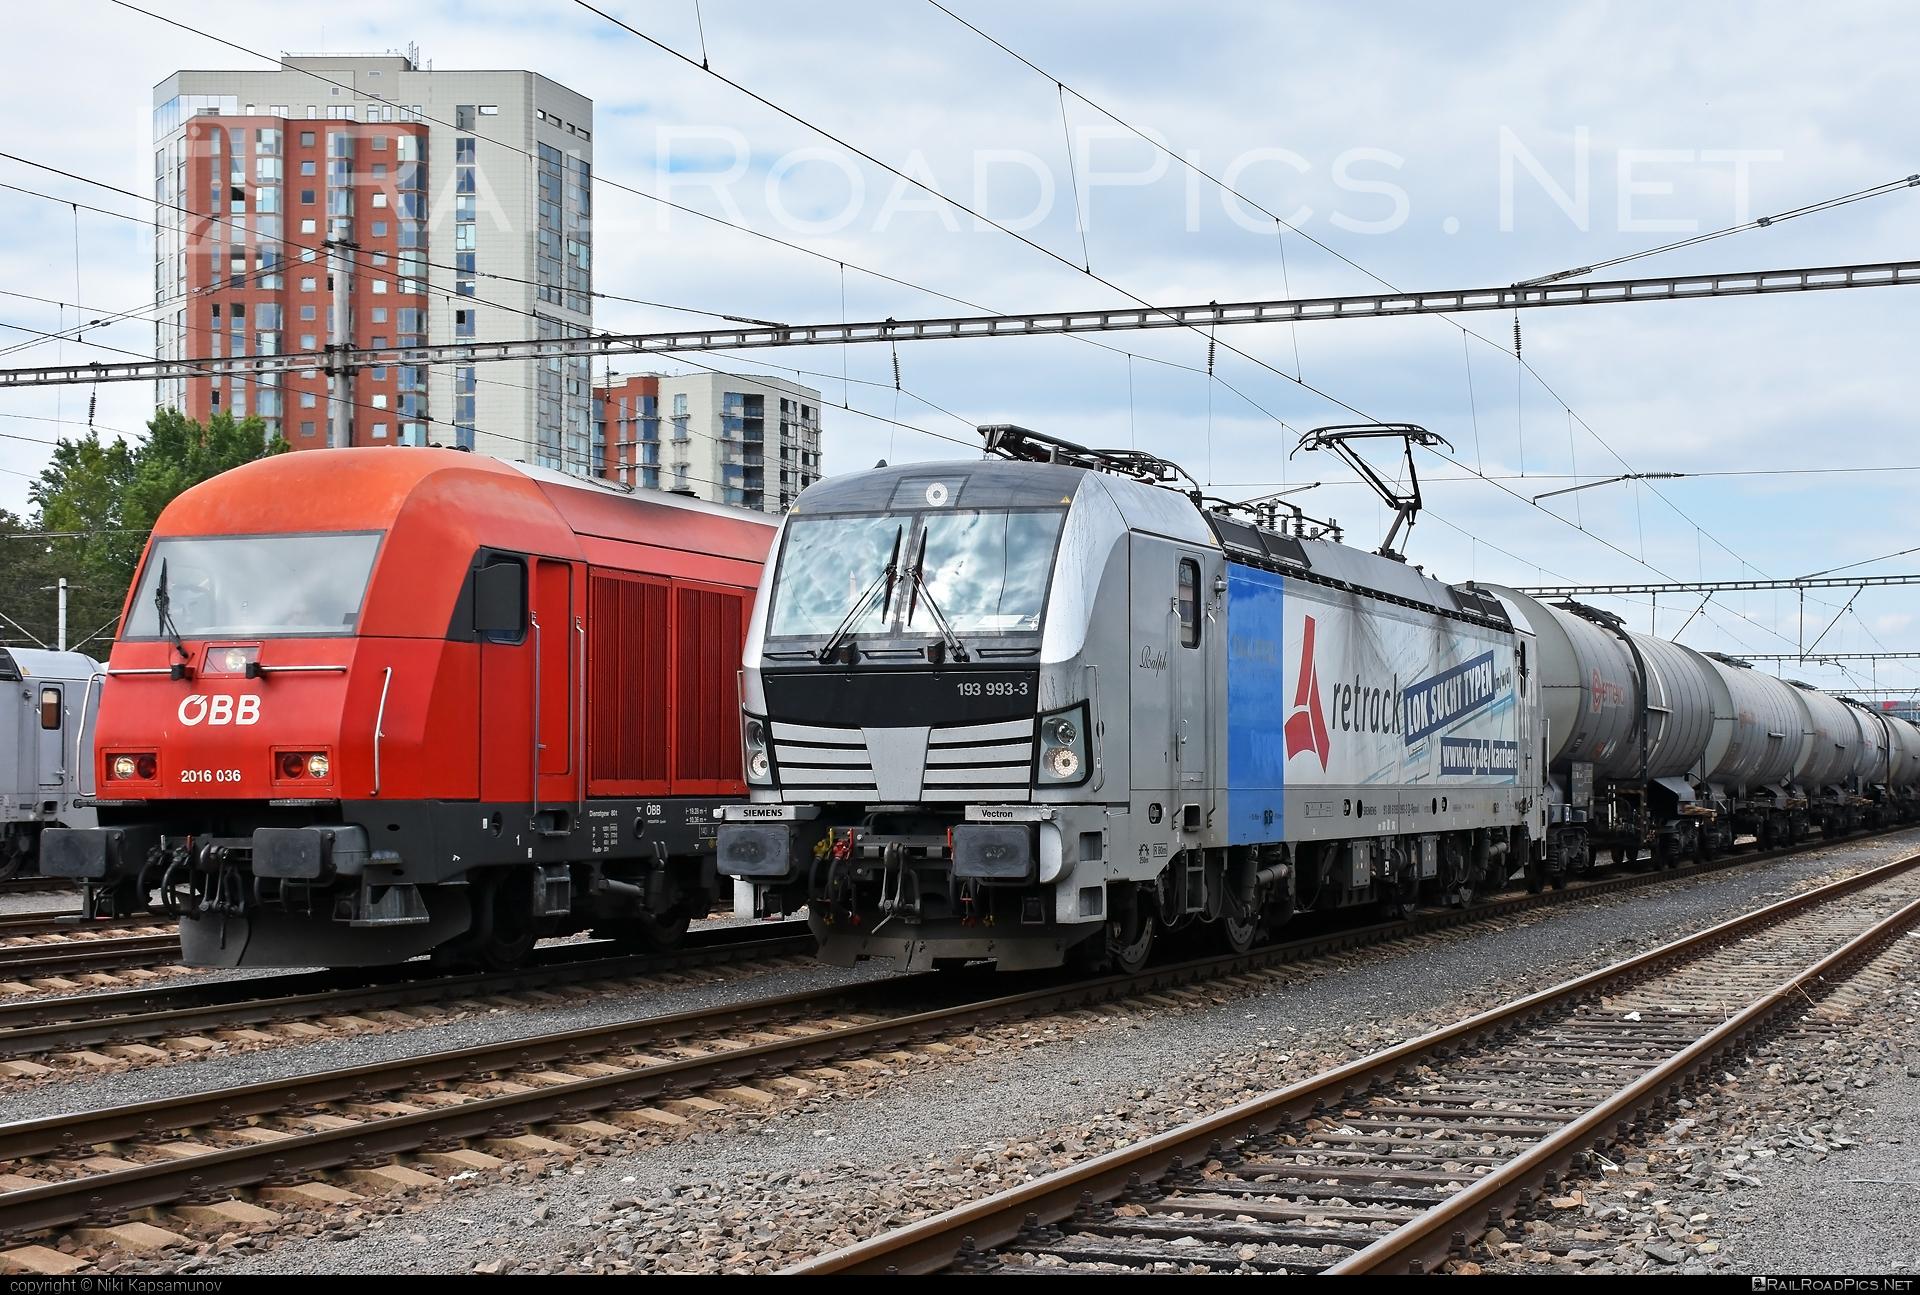 Siemens Vectron AC - 193 993-3 operated by Retrack GmbH & Co. KG #kesselwagen #railpool #railpoolgmbh #retrack #retrackgmbh #siemens #siemensvectron #siemensvectronac #tankwagon #vectron #vectronac